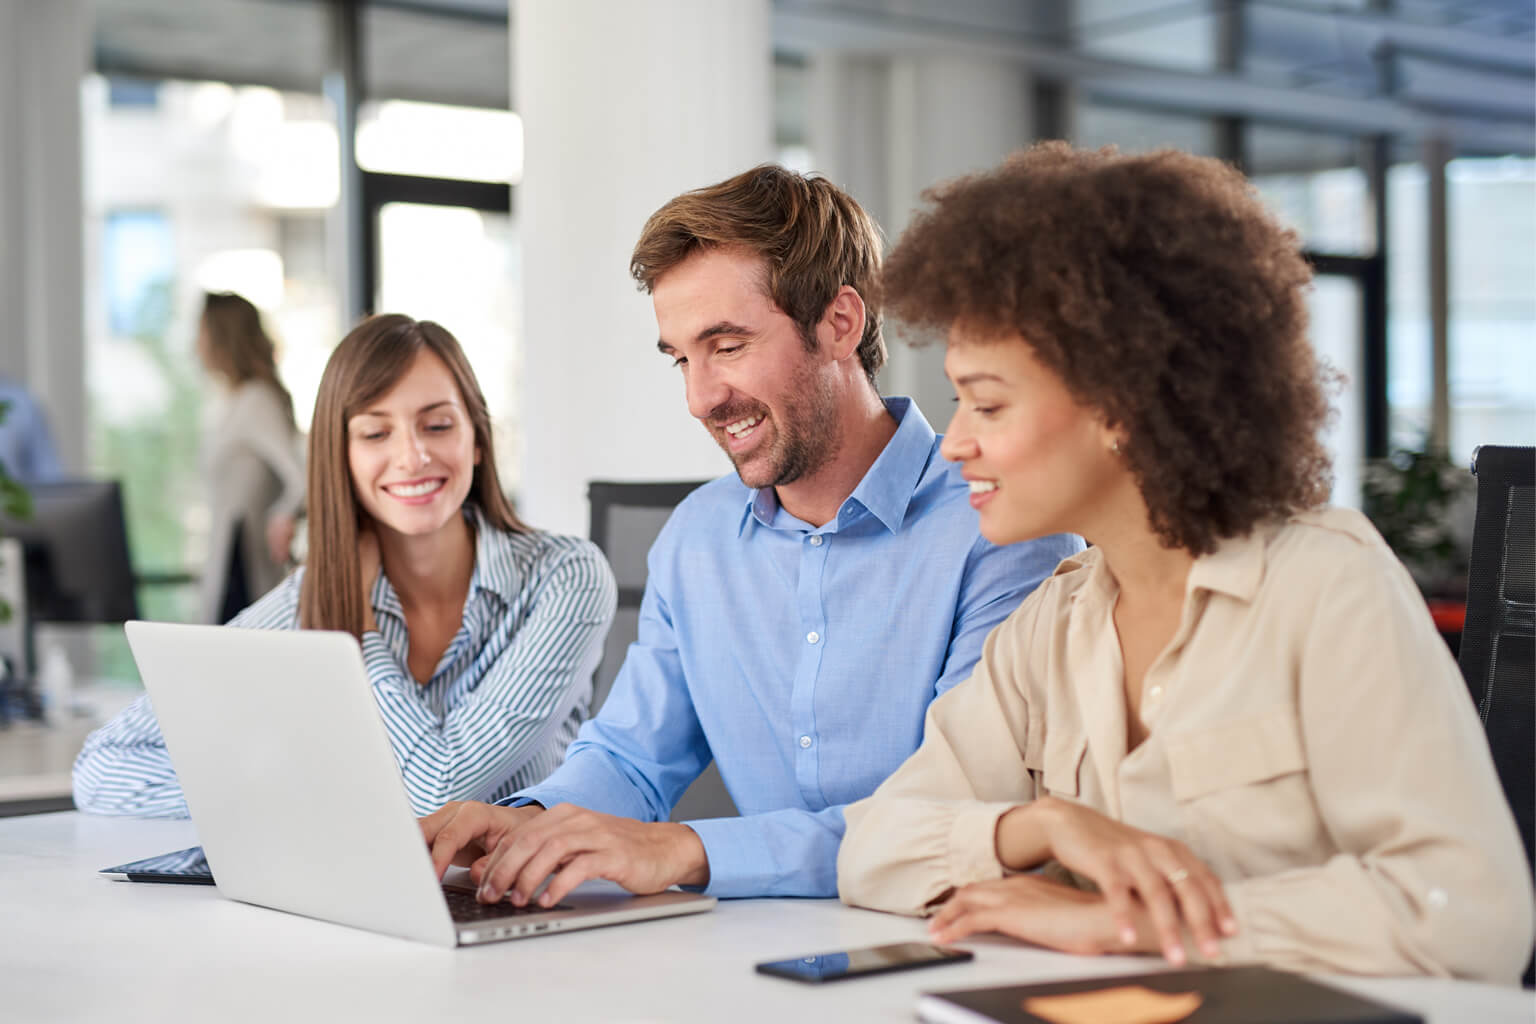 Three people surrounding a laptop